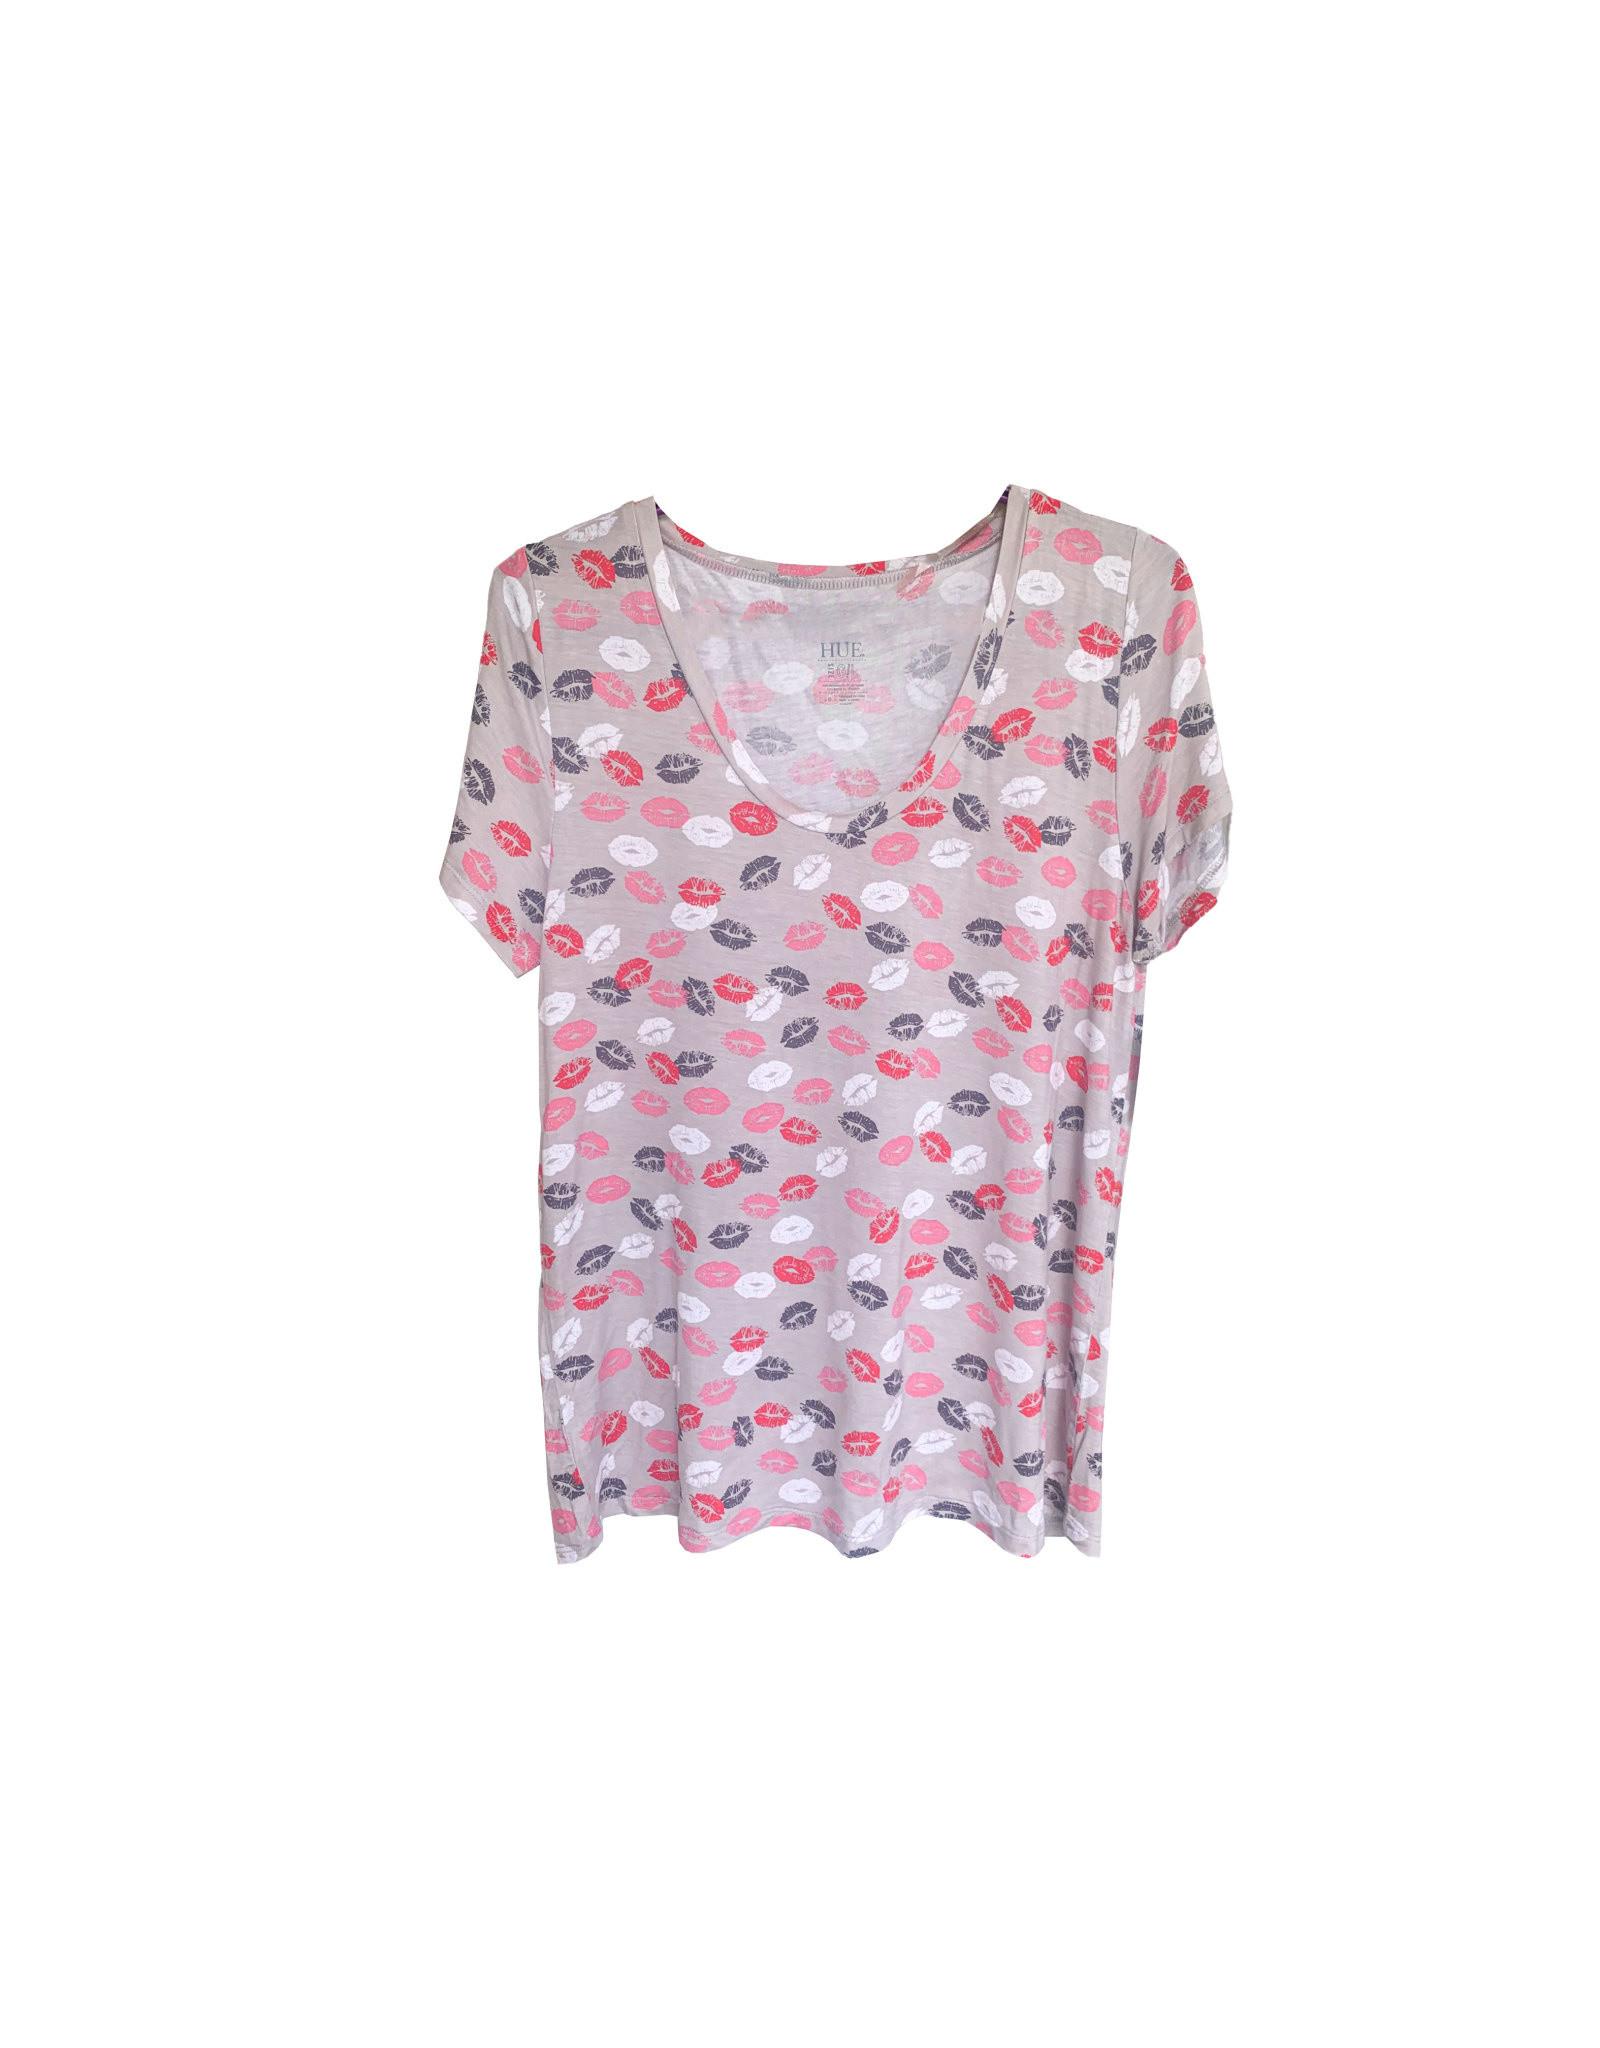 HUE HUE  Sleep T-shirt SizeL